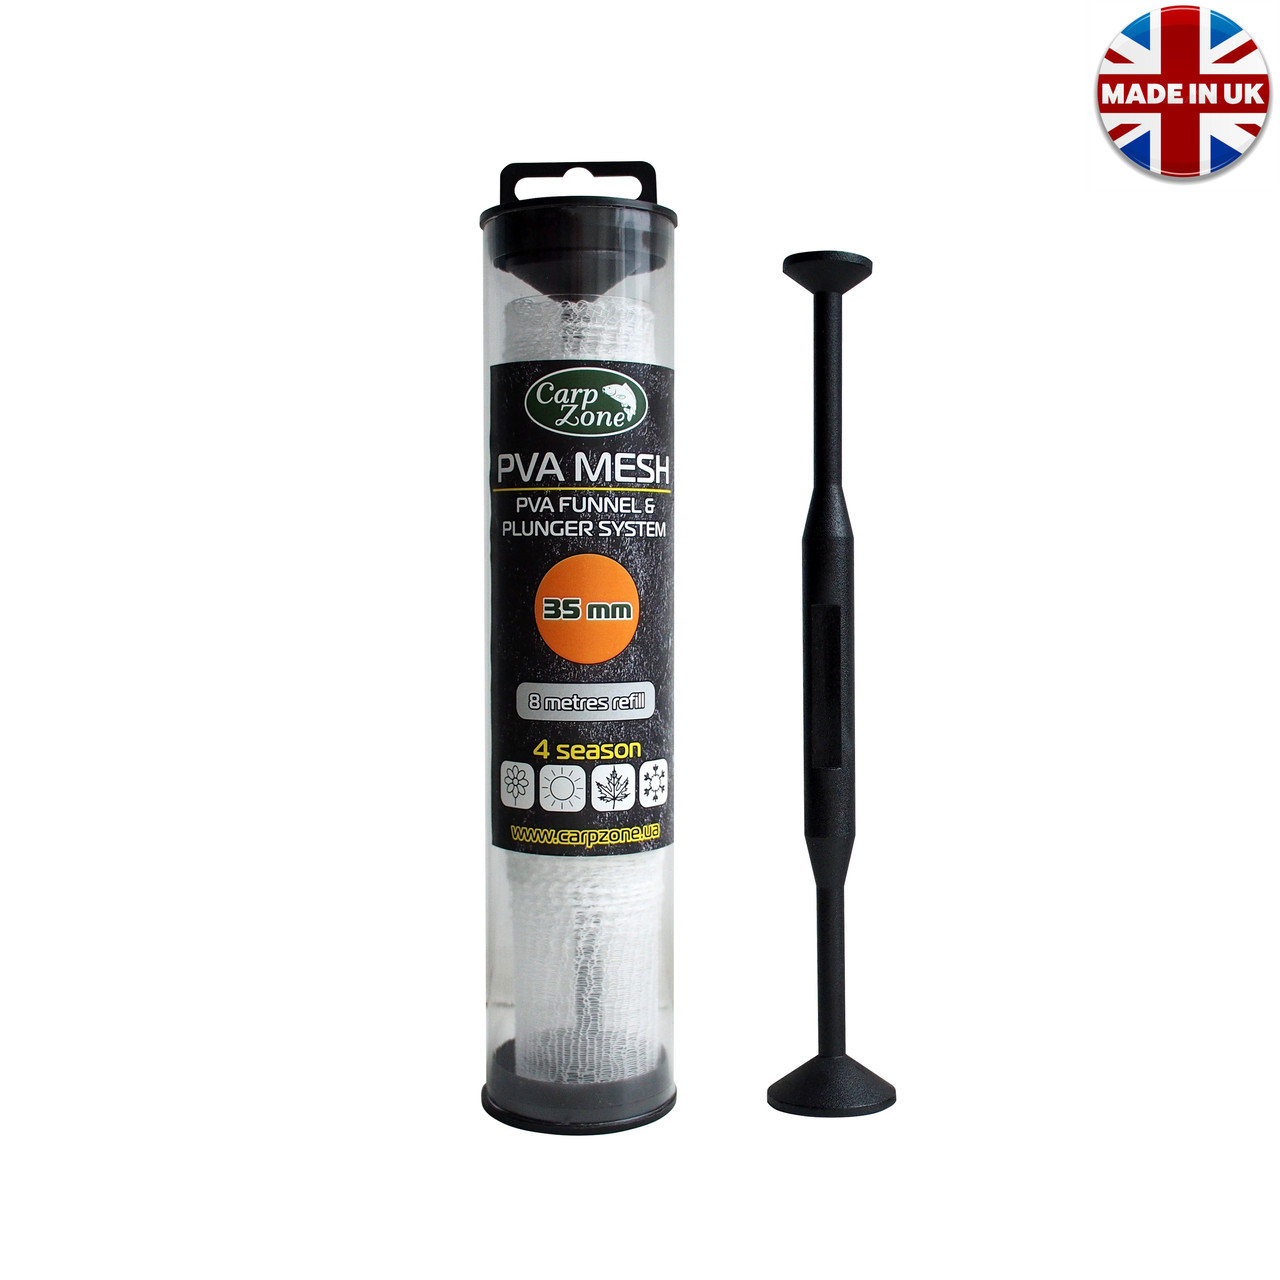 ПВА Система PVA Mesh Funnel & Plunger System  35mm